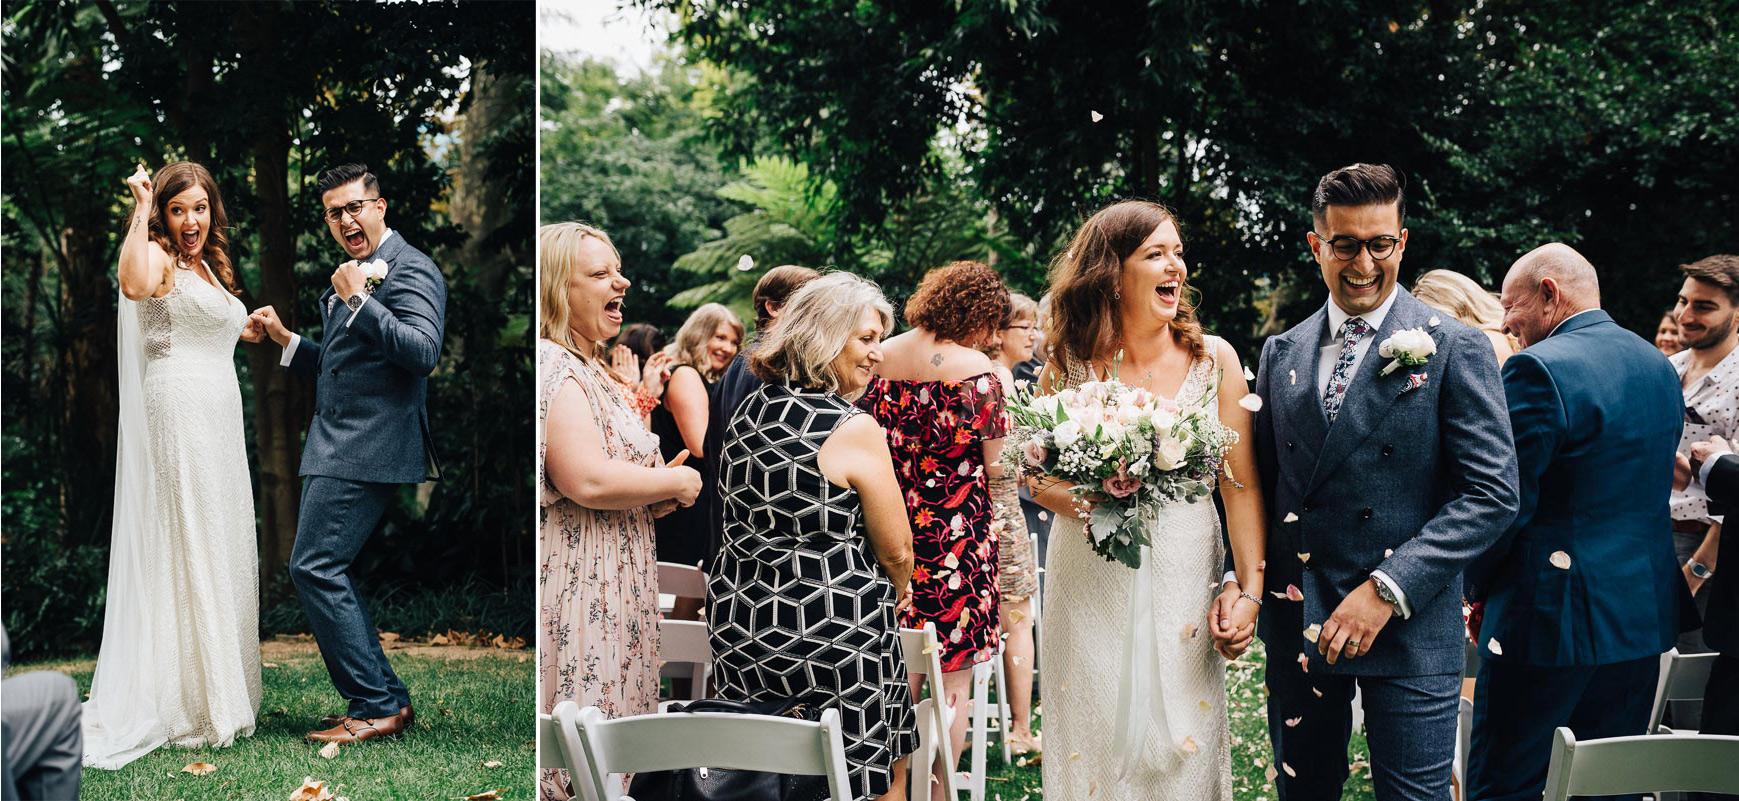 super-fun-bishops-house-wedding-65.jpg